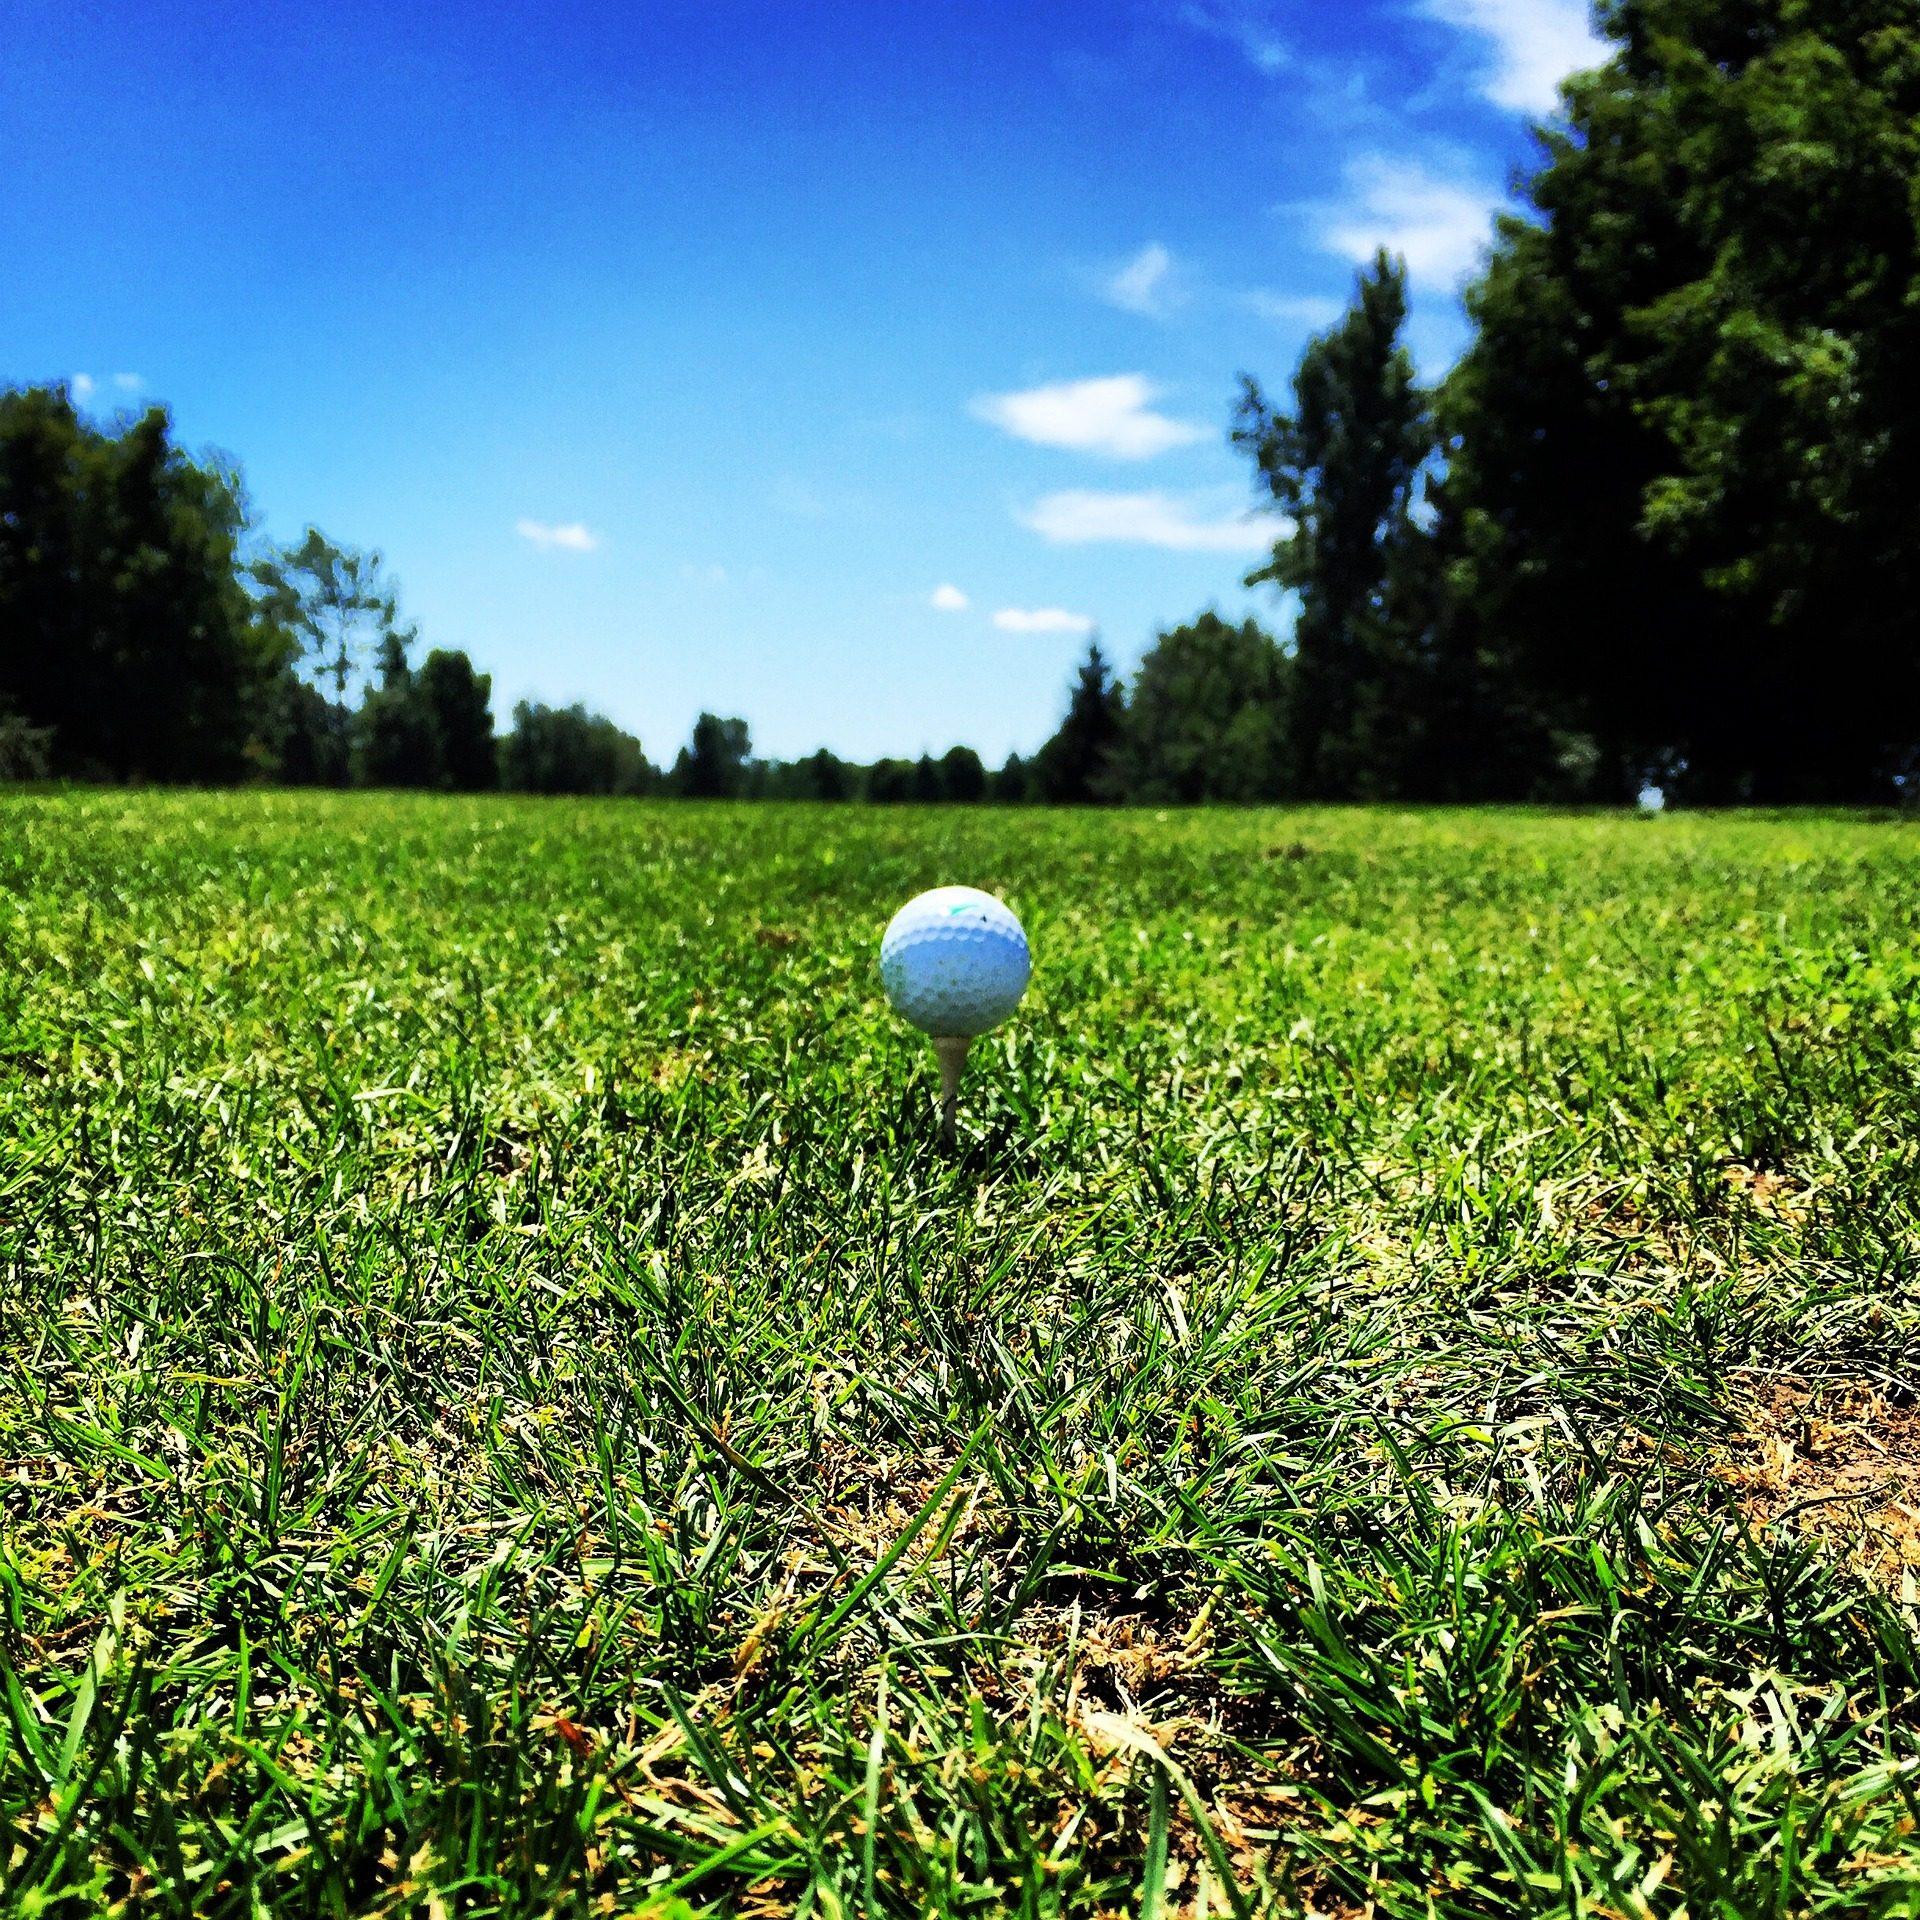 pelota, 球, 字段, 高尔夫, 草坪, 树木, 1708172346